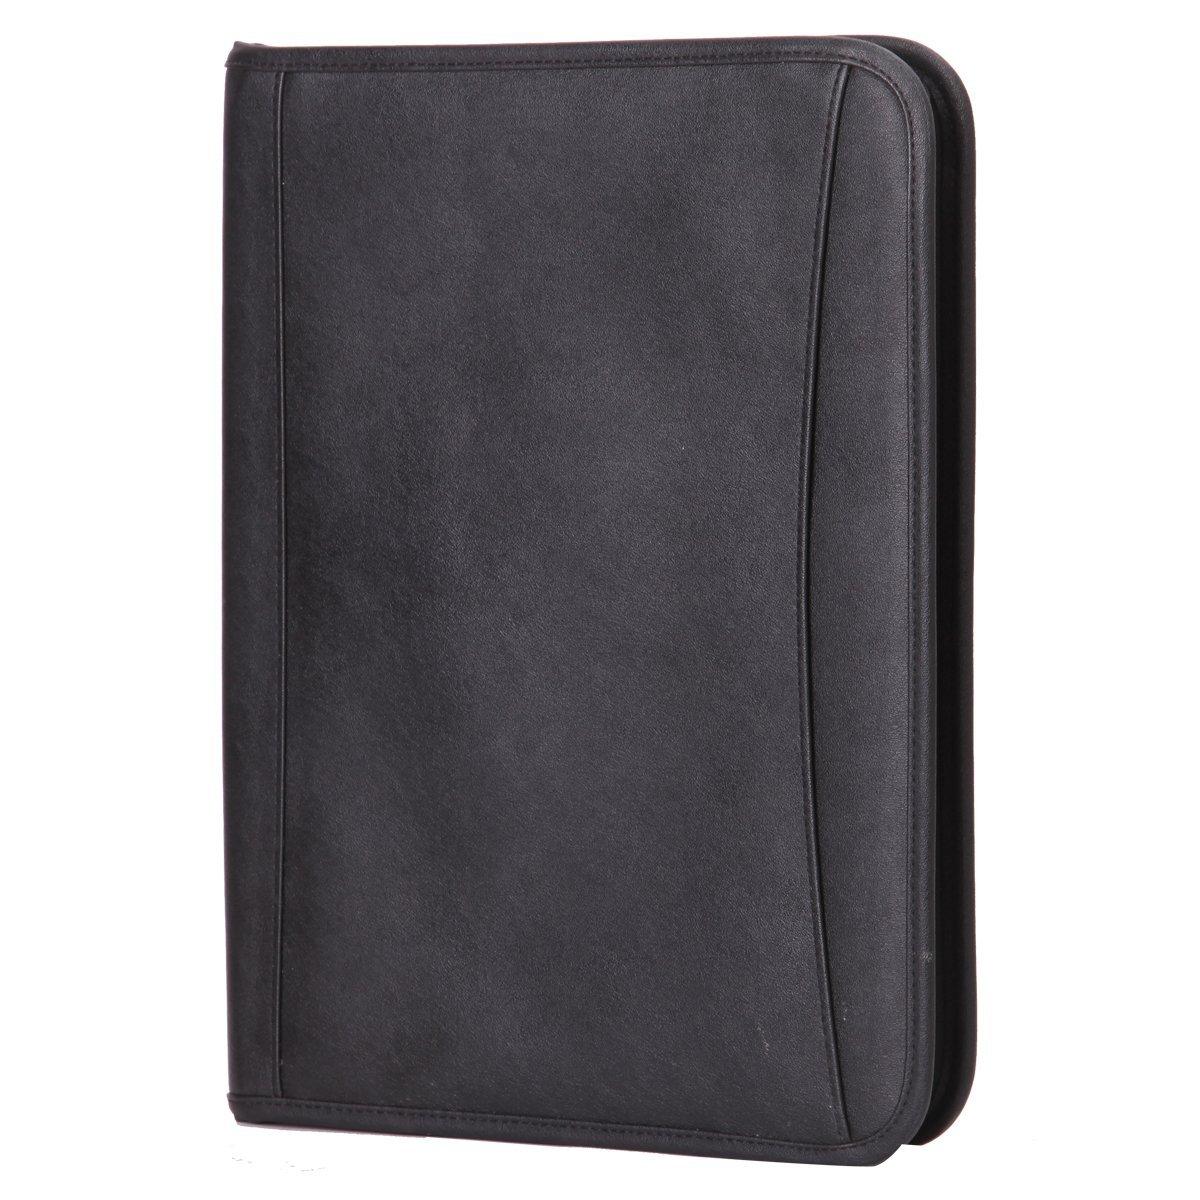 c649b2df39b8 Leathario-Portfolio en cuir PU, porte document, portfolio cuir pour bureau,  agenda